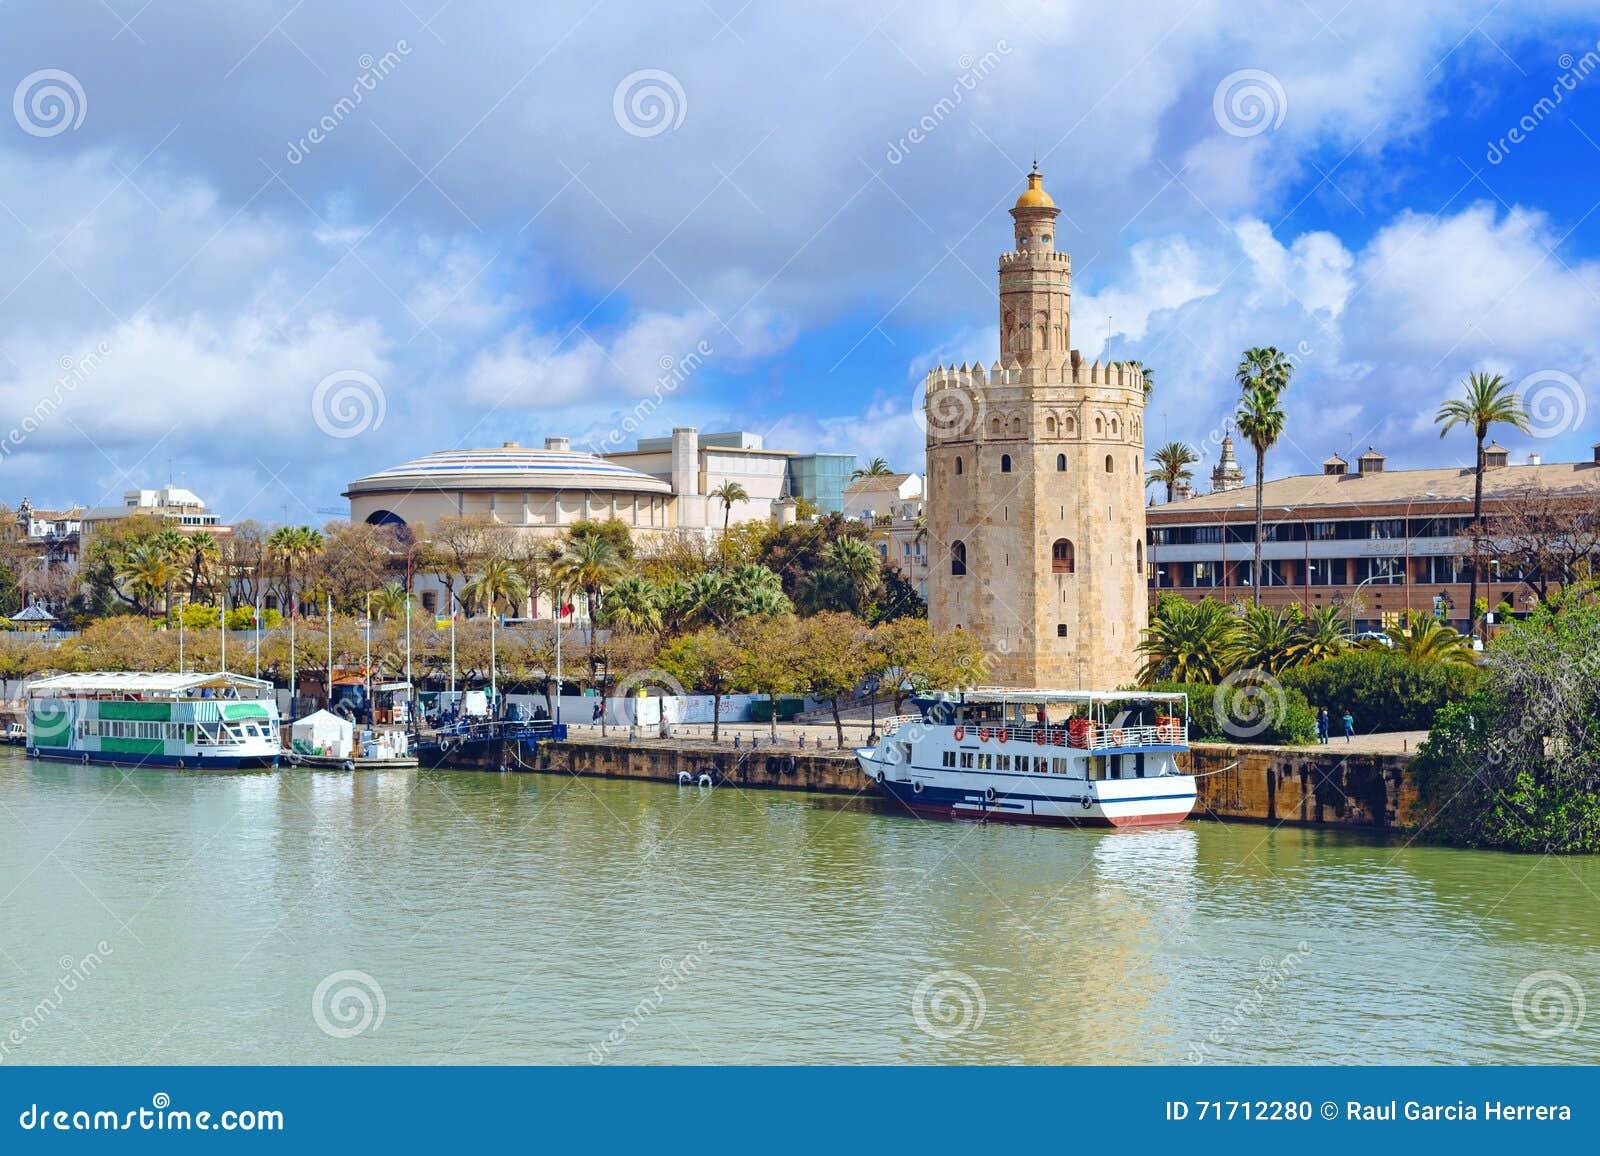 Goldener Turm entlang dem Guadalquivir-Fluss in Sevilla, Andalusien, Spanien, Europa